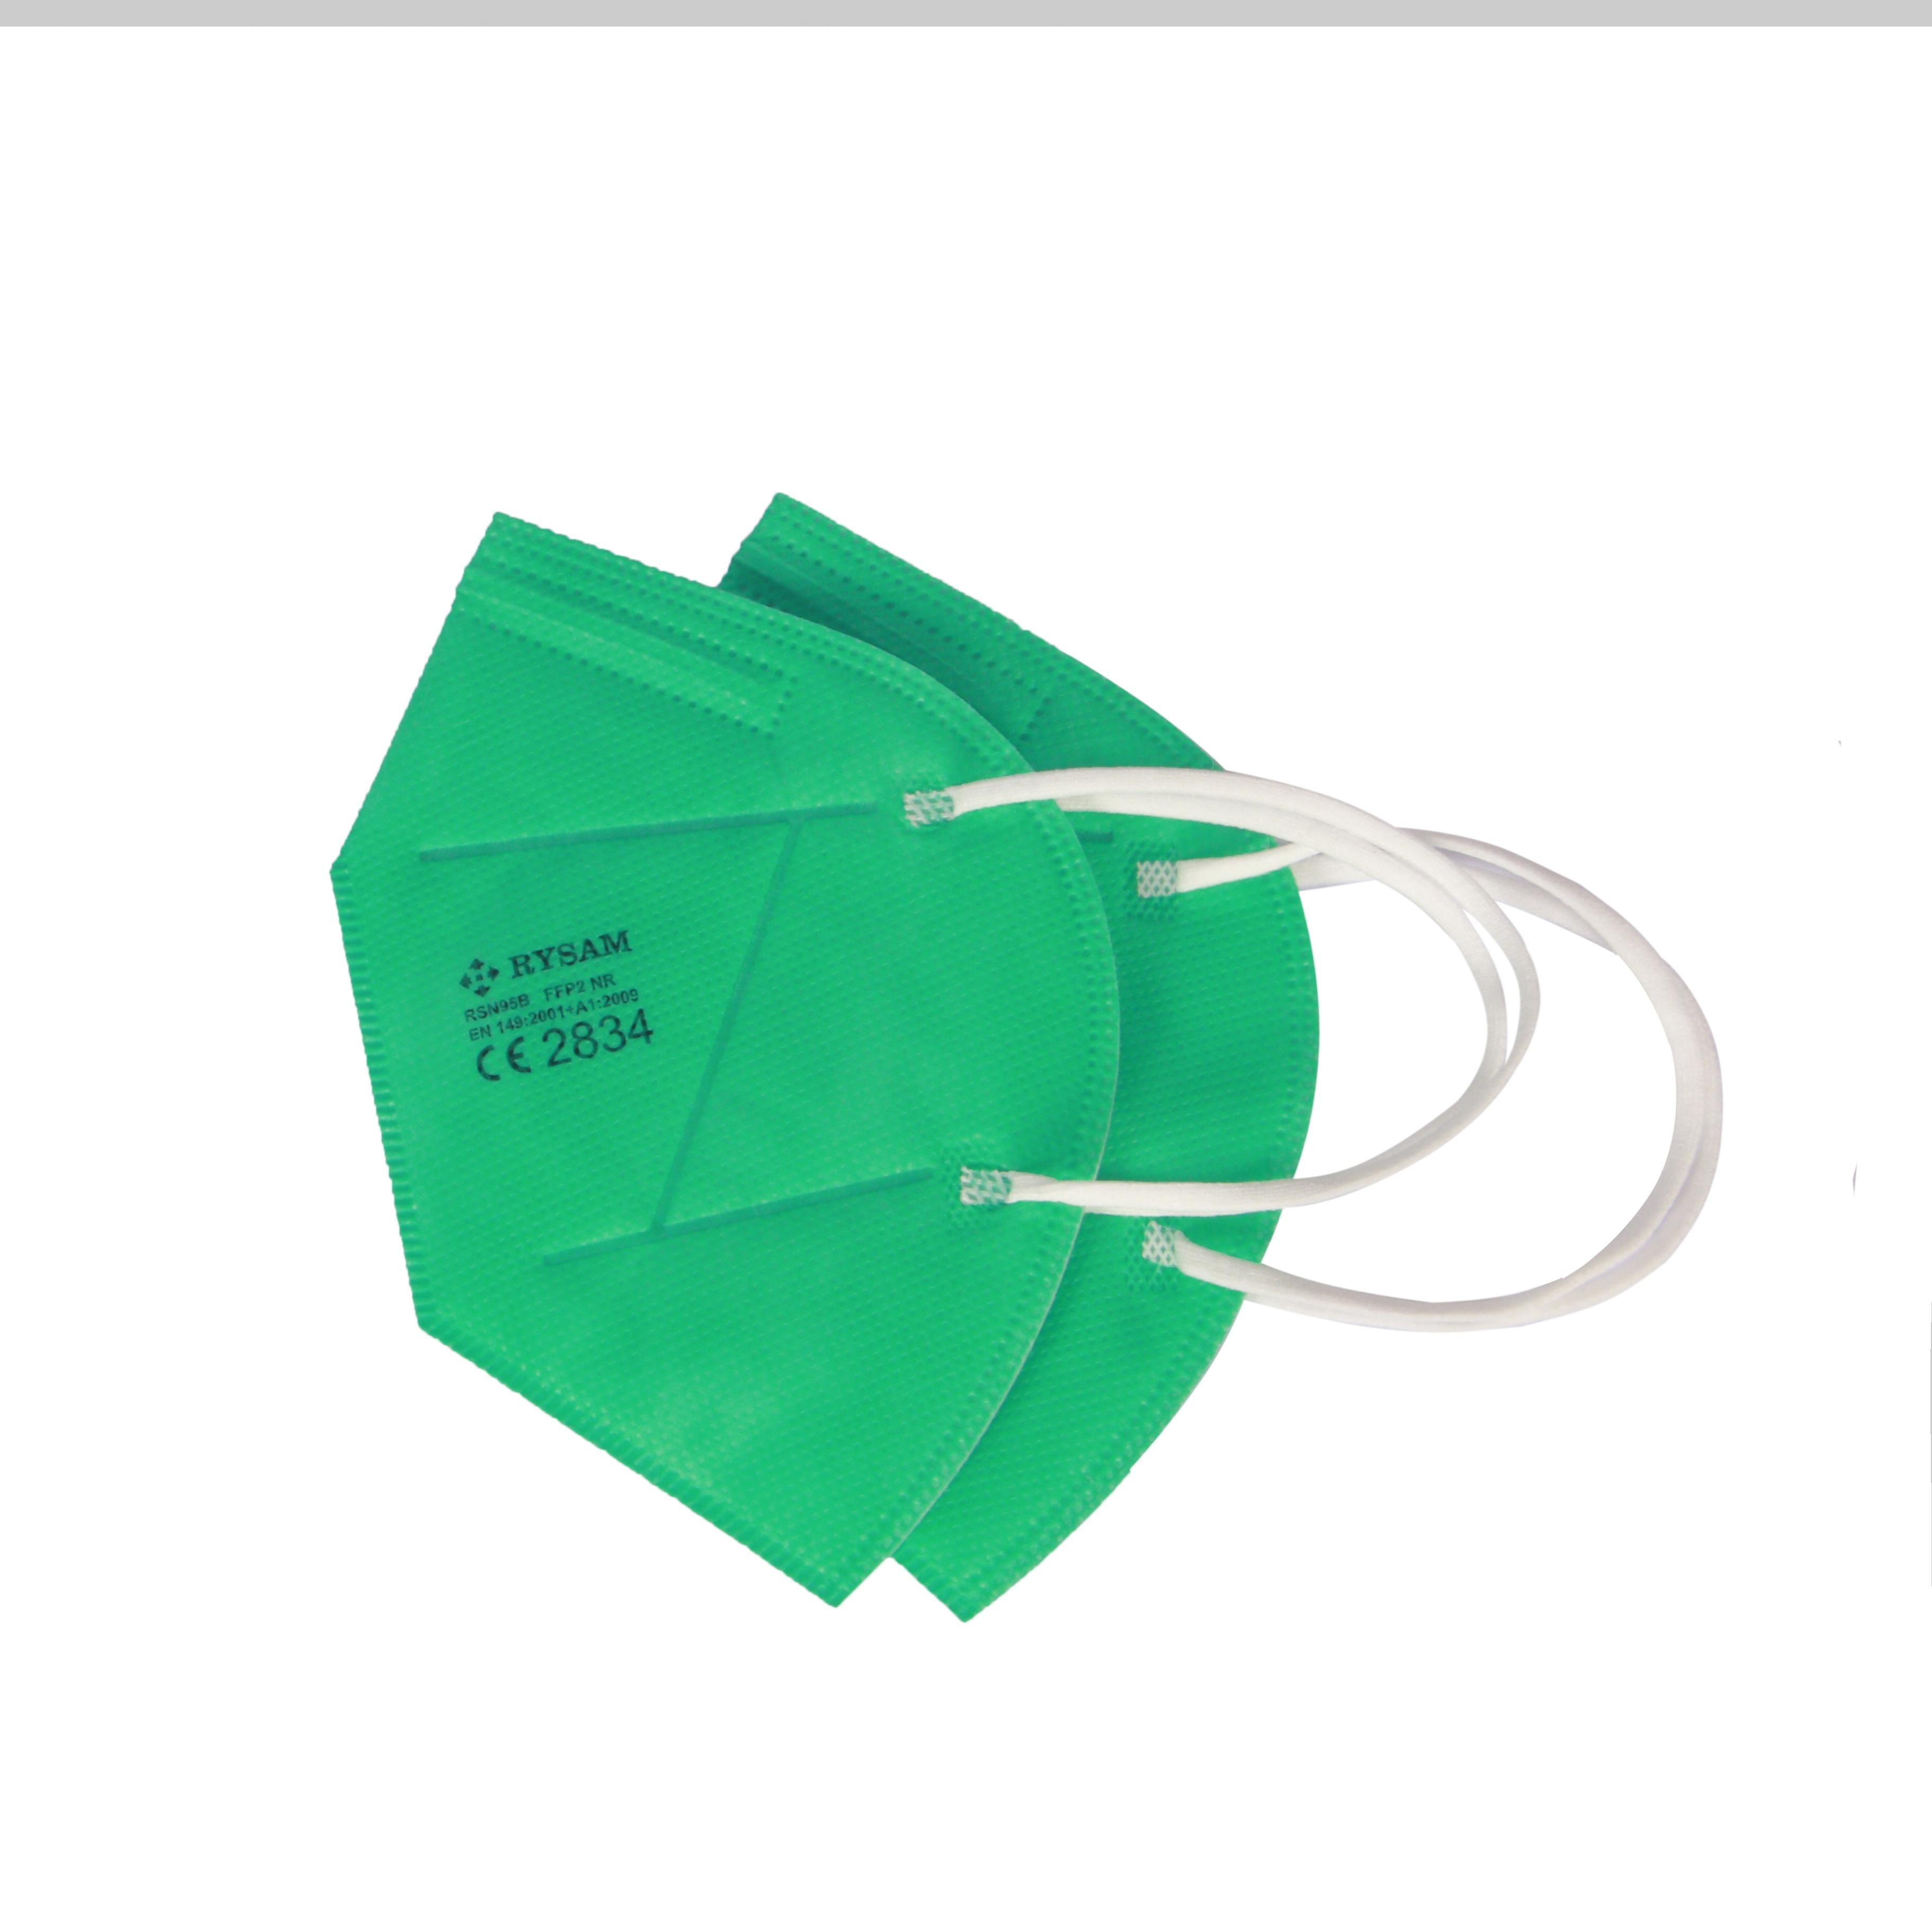 Particle Filtering FFP2 EN149:2001+A1:2009 FFP2 green respirators - KingCare   KingCare.net